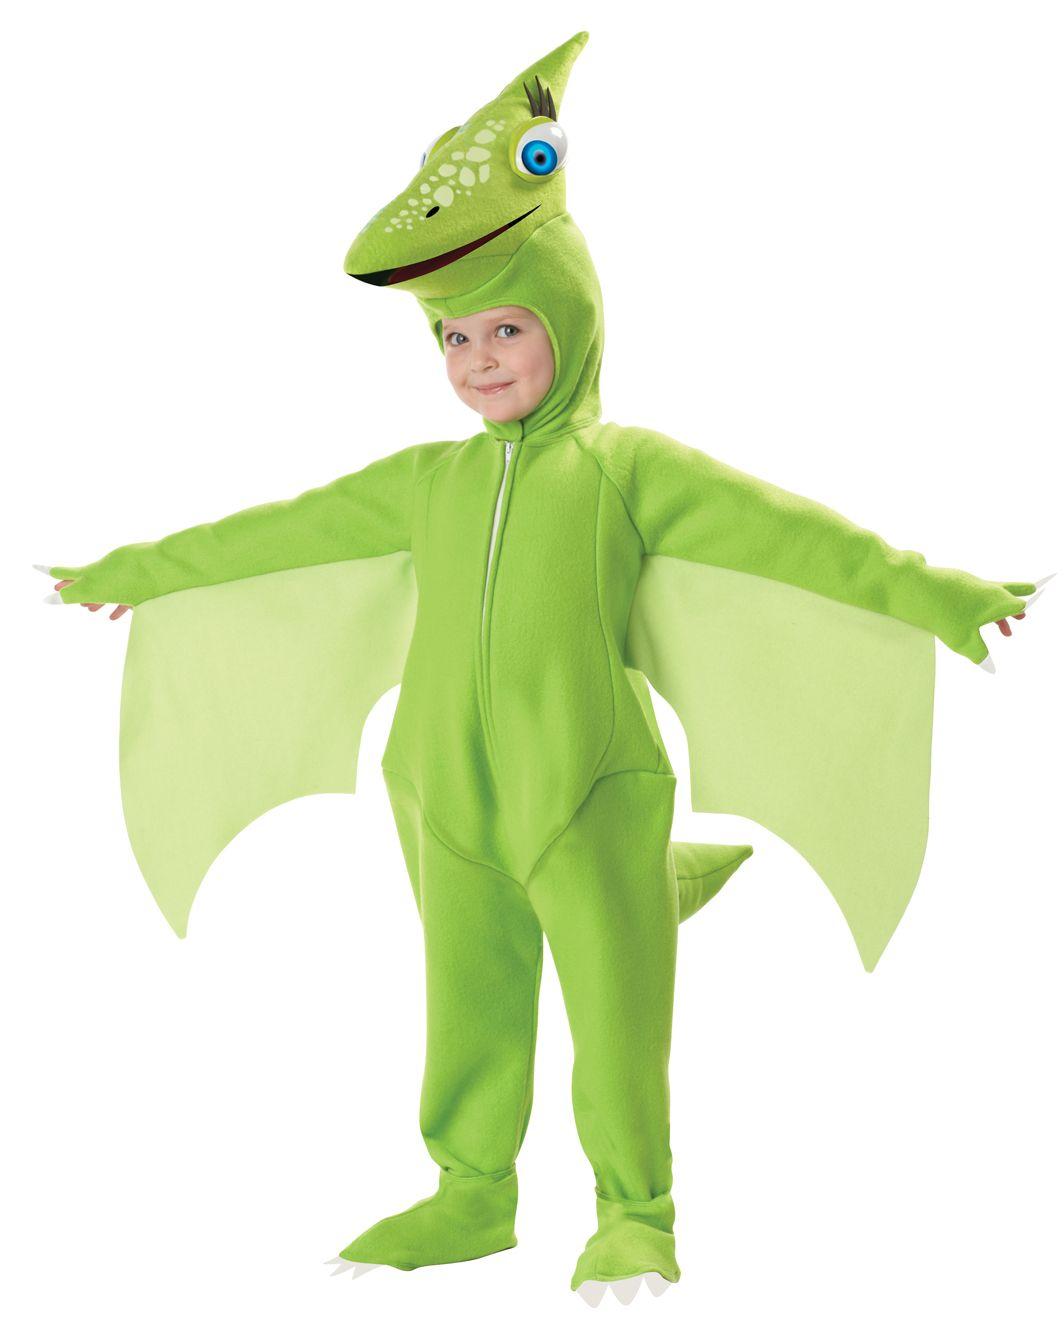 Tiny from Dinosaur Train has arrived! Shop for your dinosaur ...